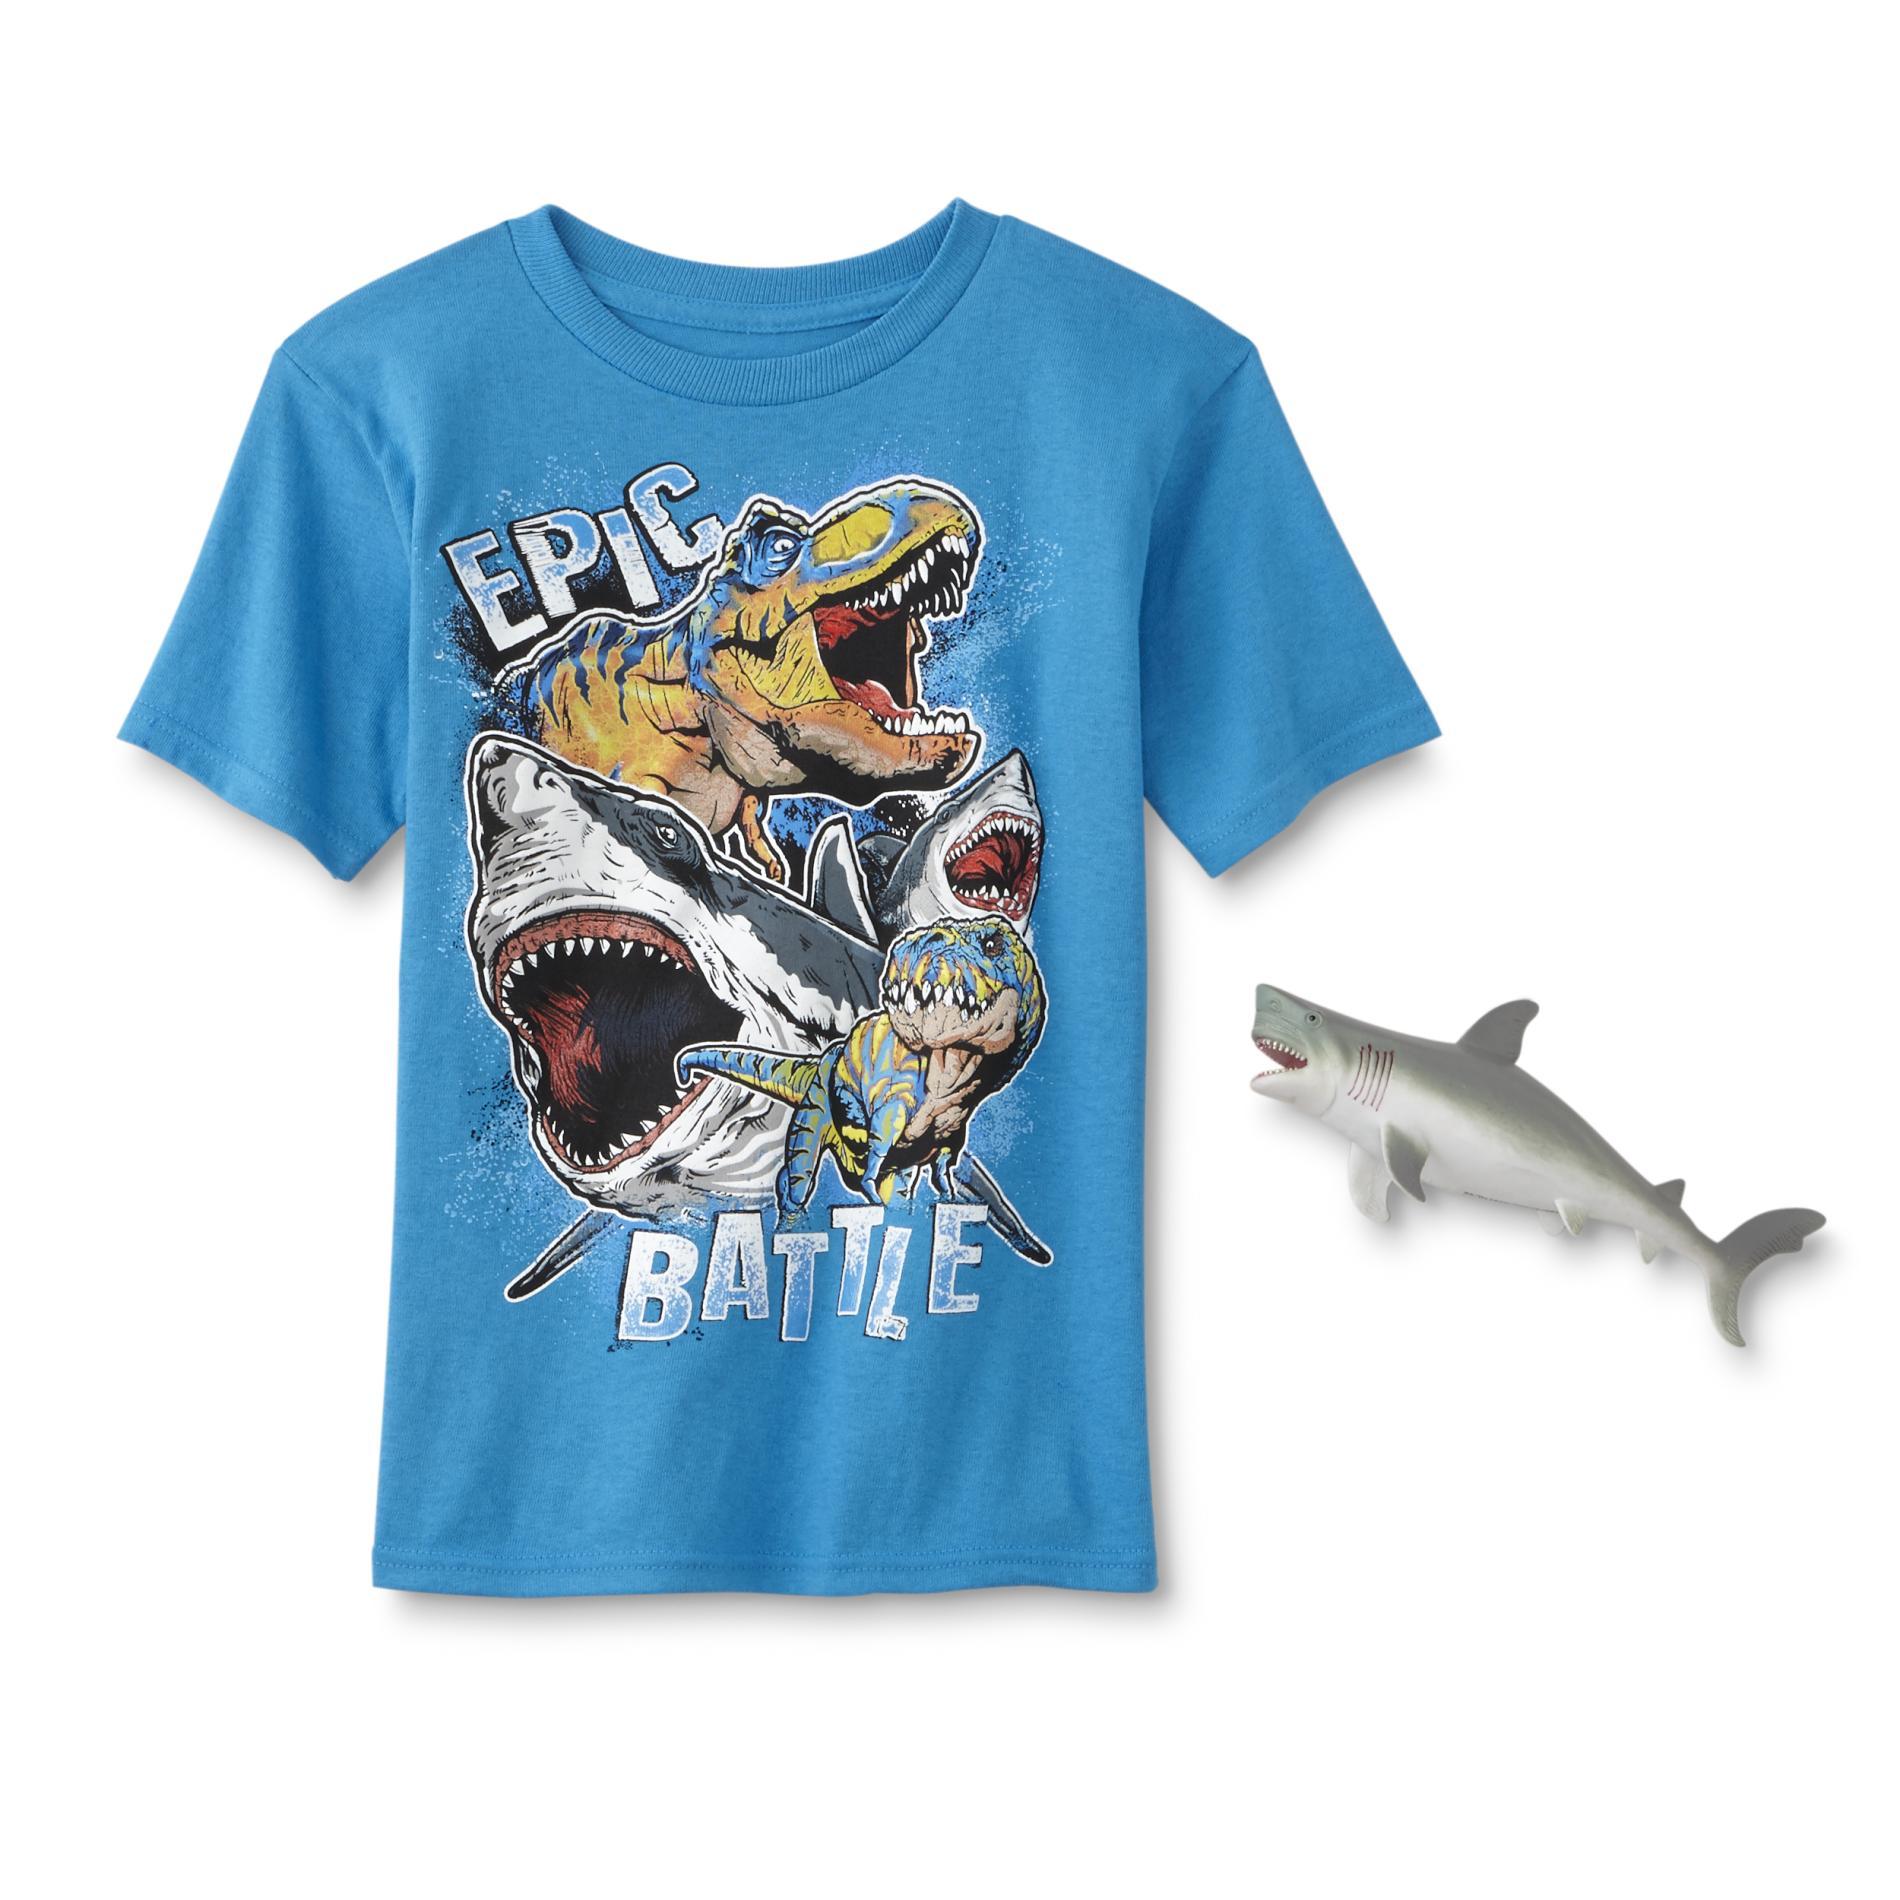 Boy's Graphic T-Shirt & Toy - Apex Predators